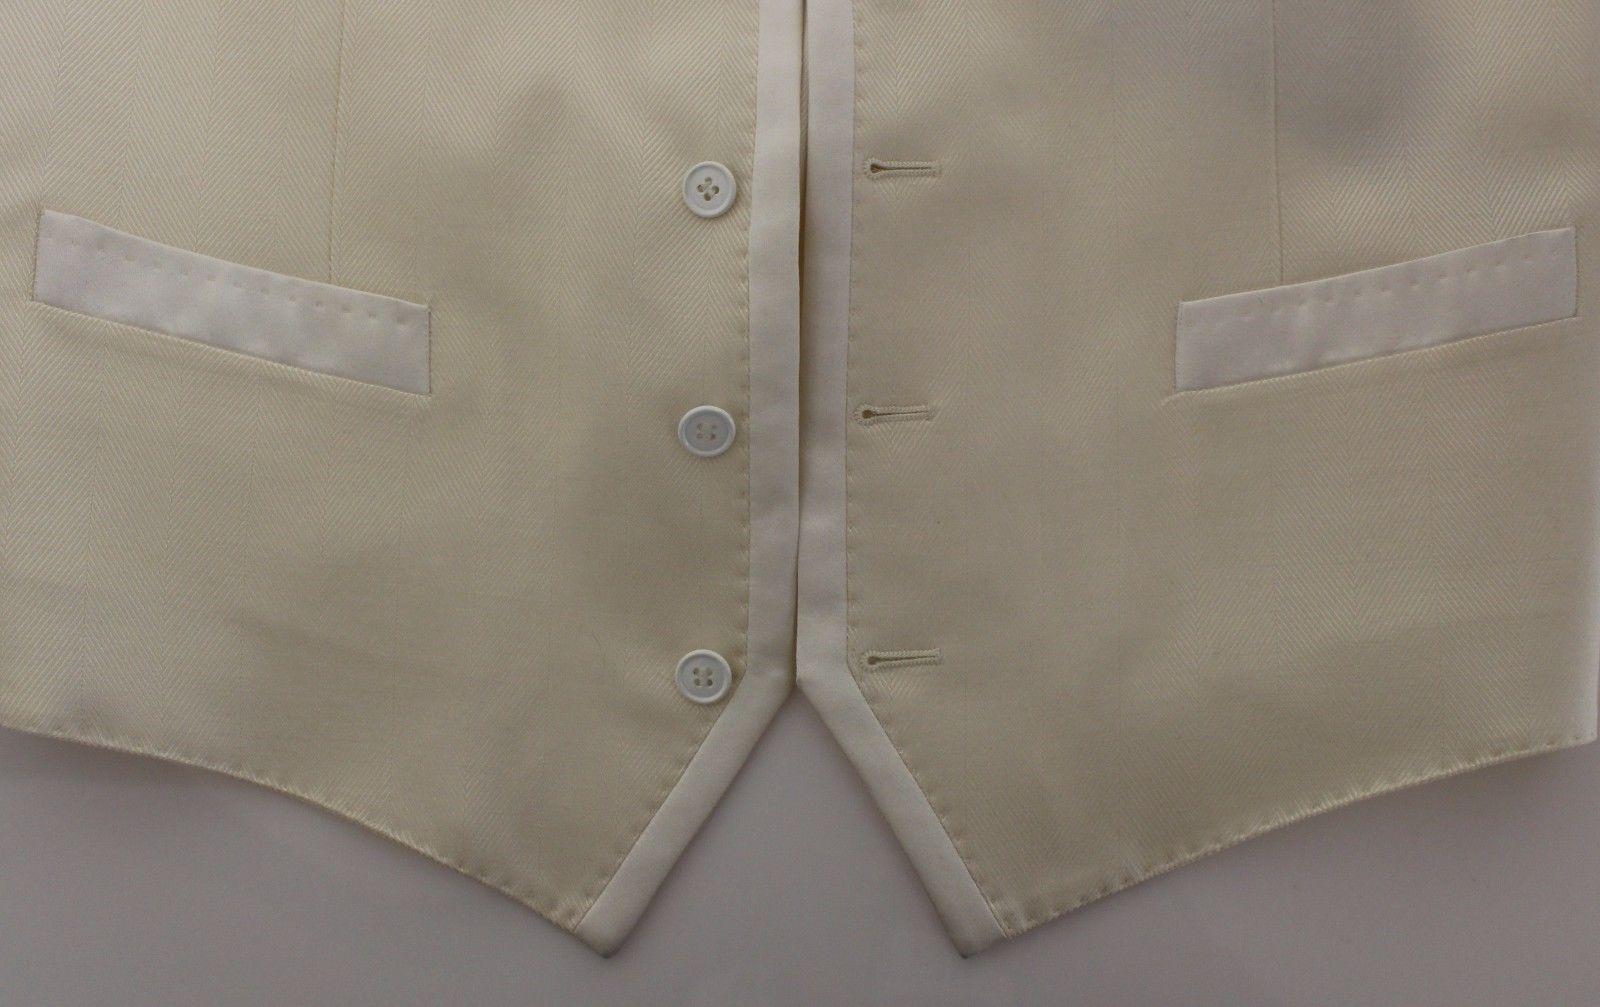 Dolce & Gabbana White Wool Blend Dress Vest Blazer Jacket